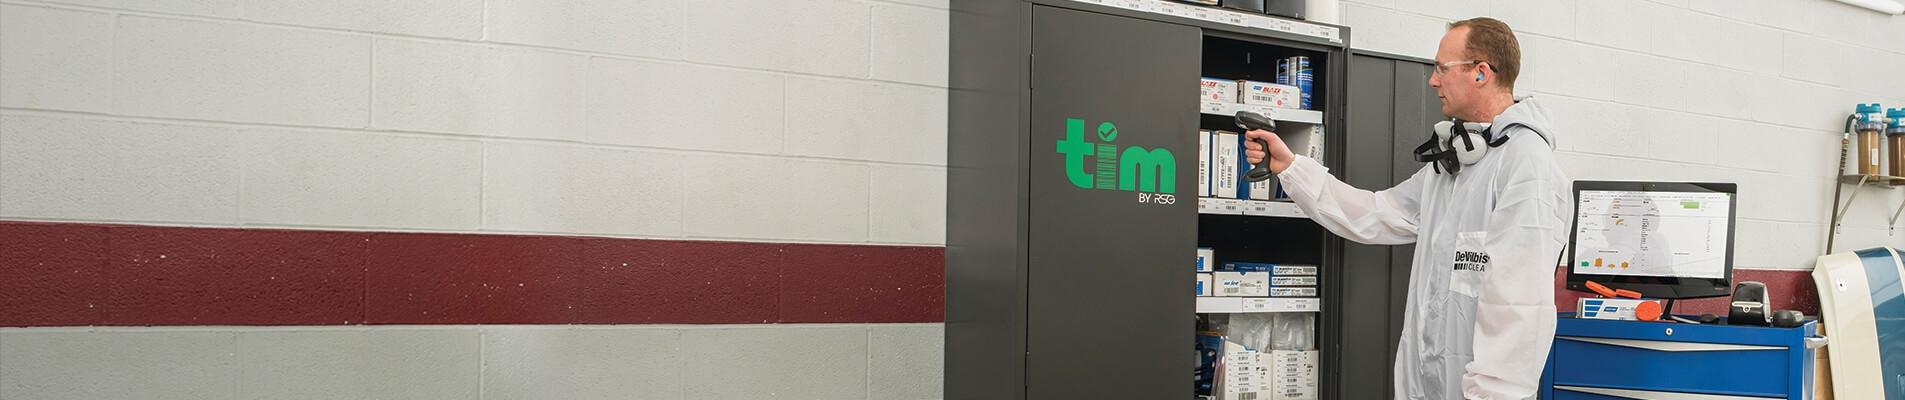 RSG-TIM